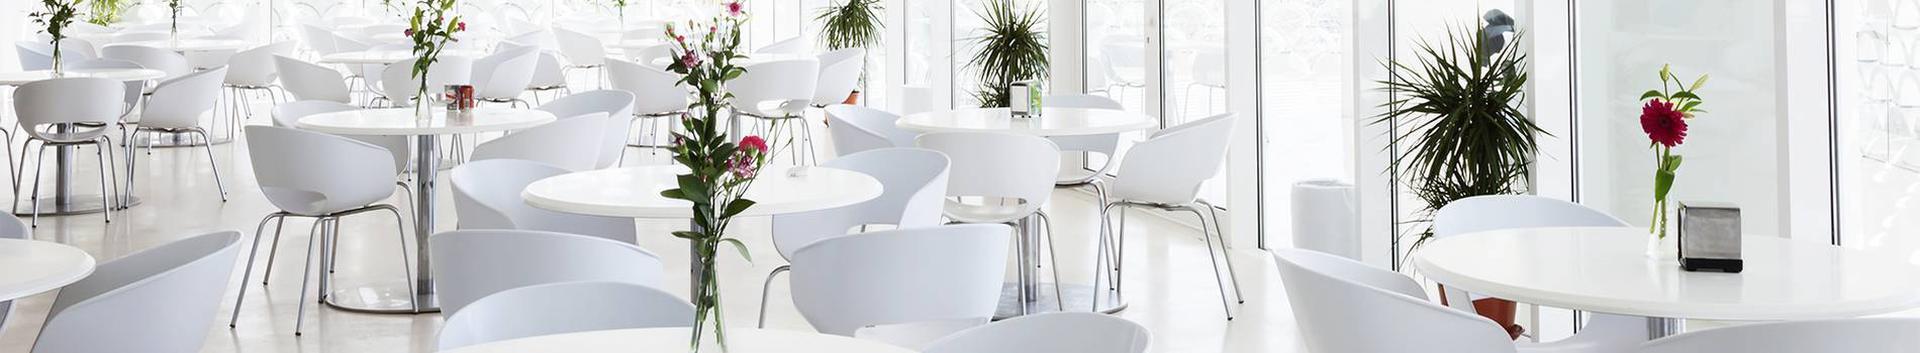 56101_toitlustus-restoran-jm-_80320208_xl.jpg